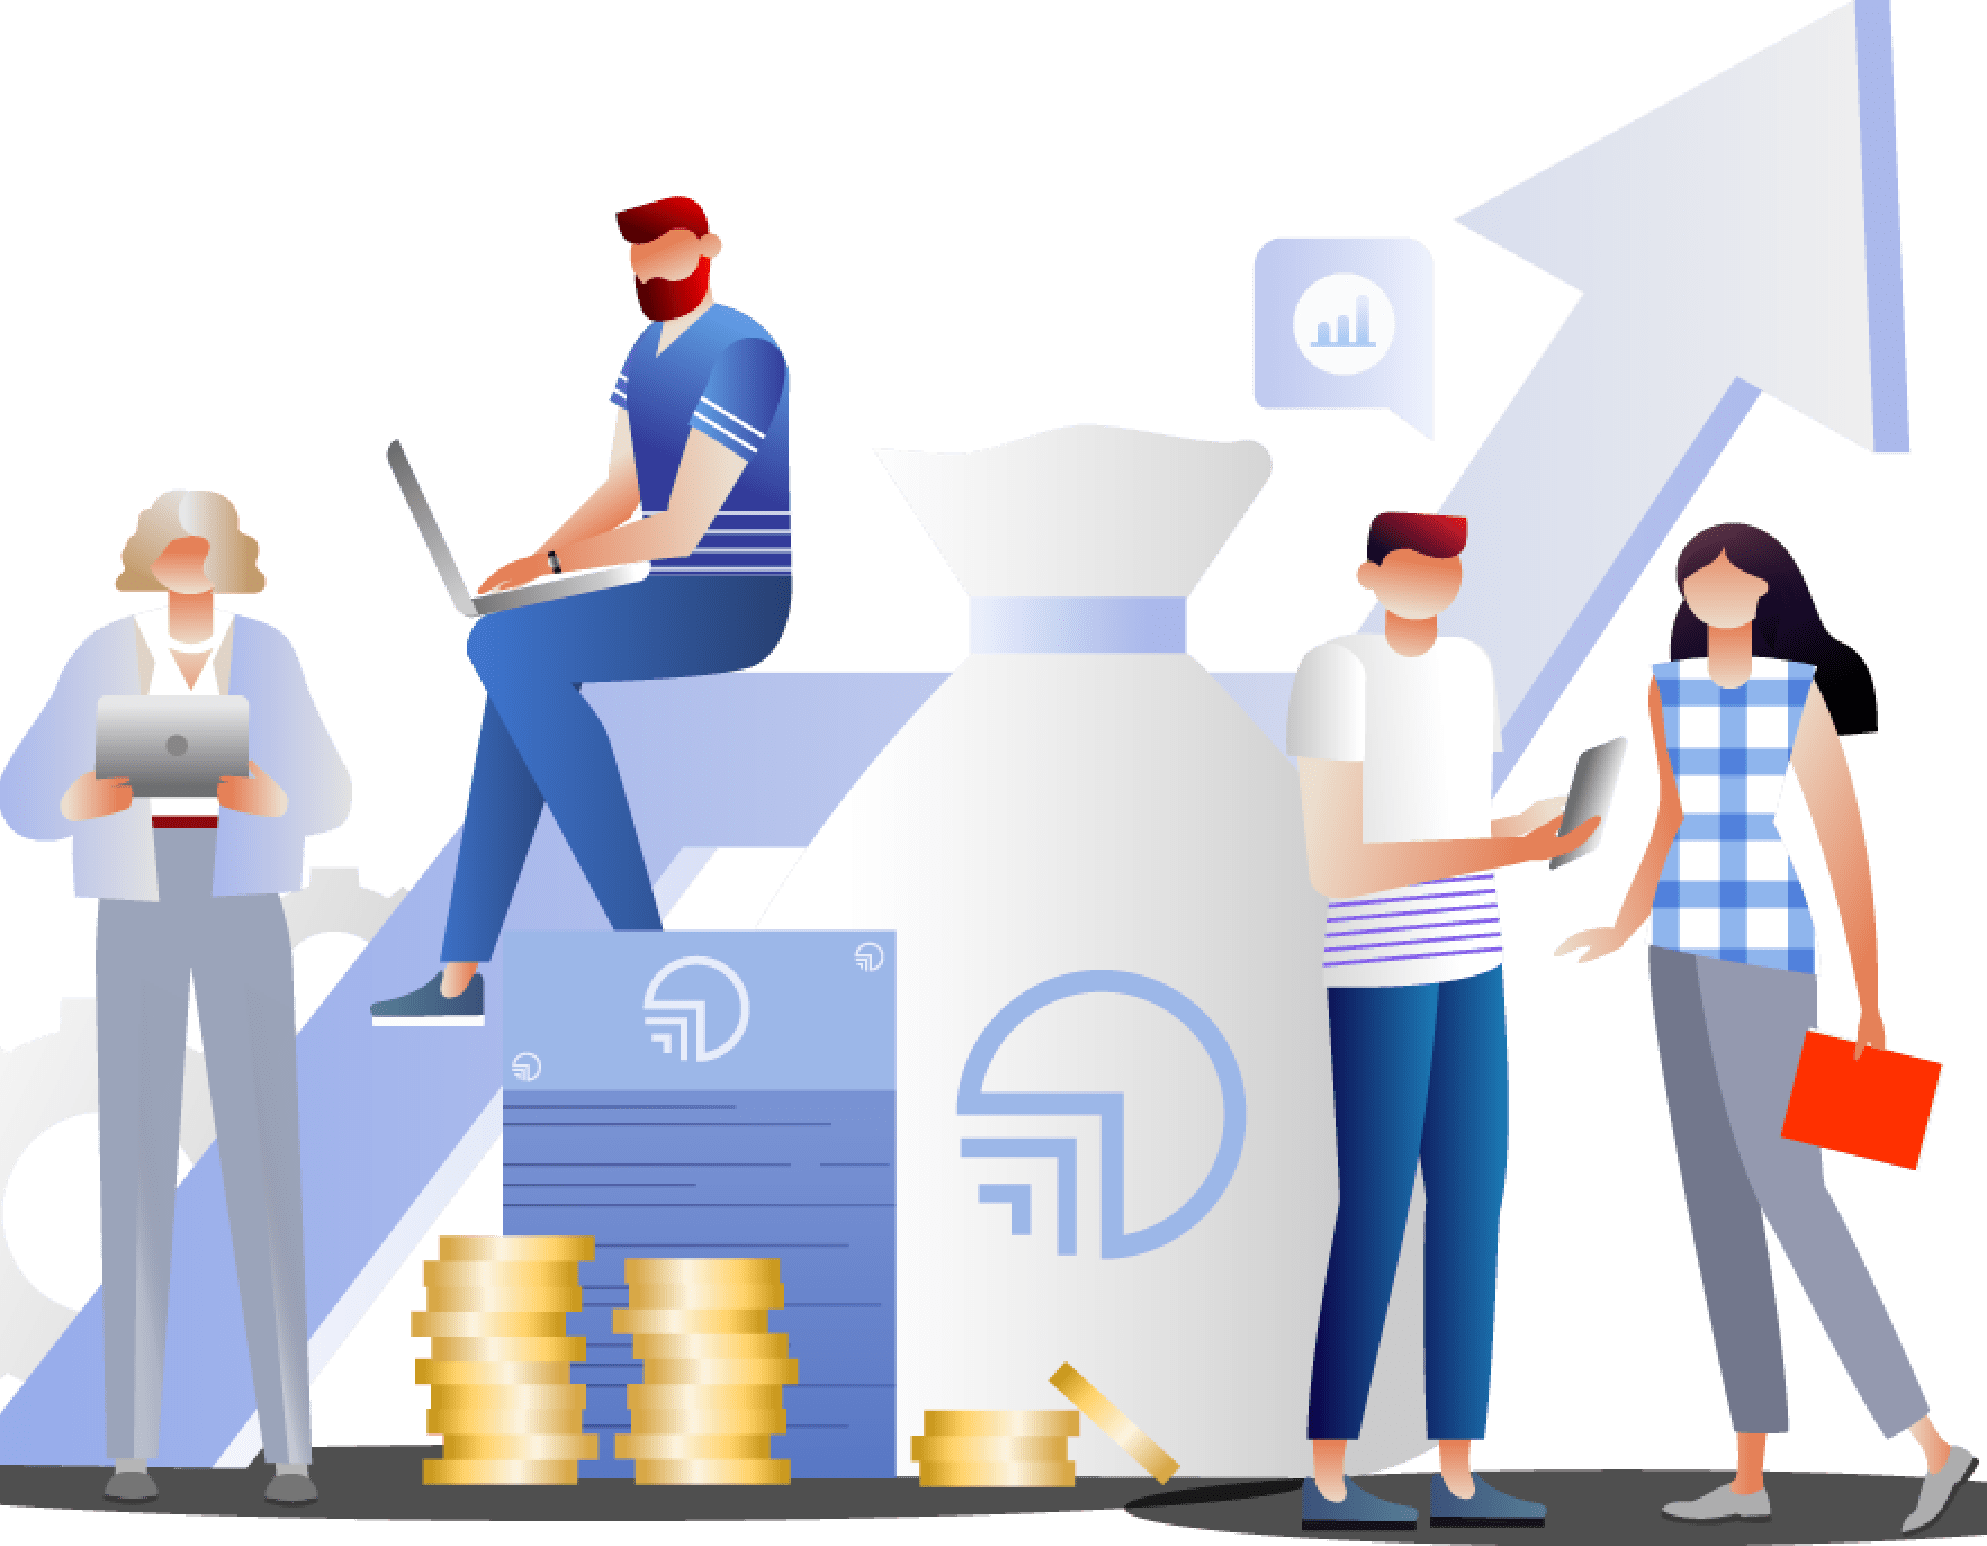 Investor Profile UI Page Banner Image 2